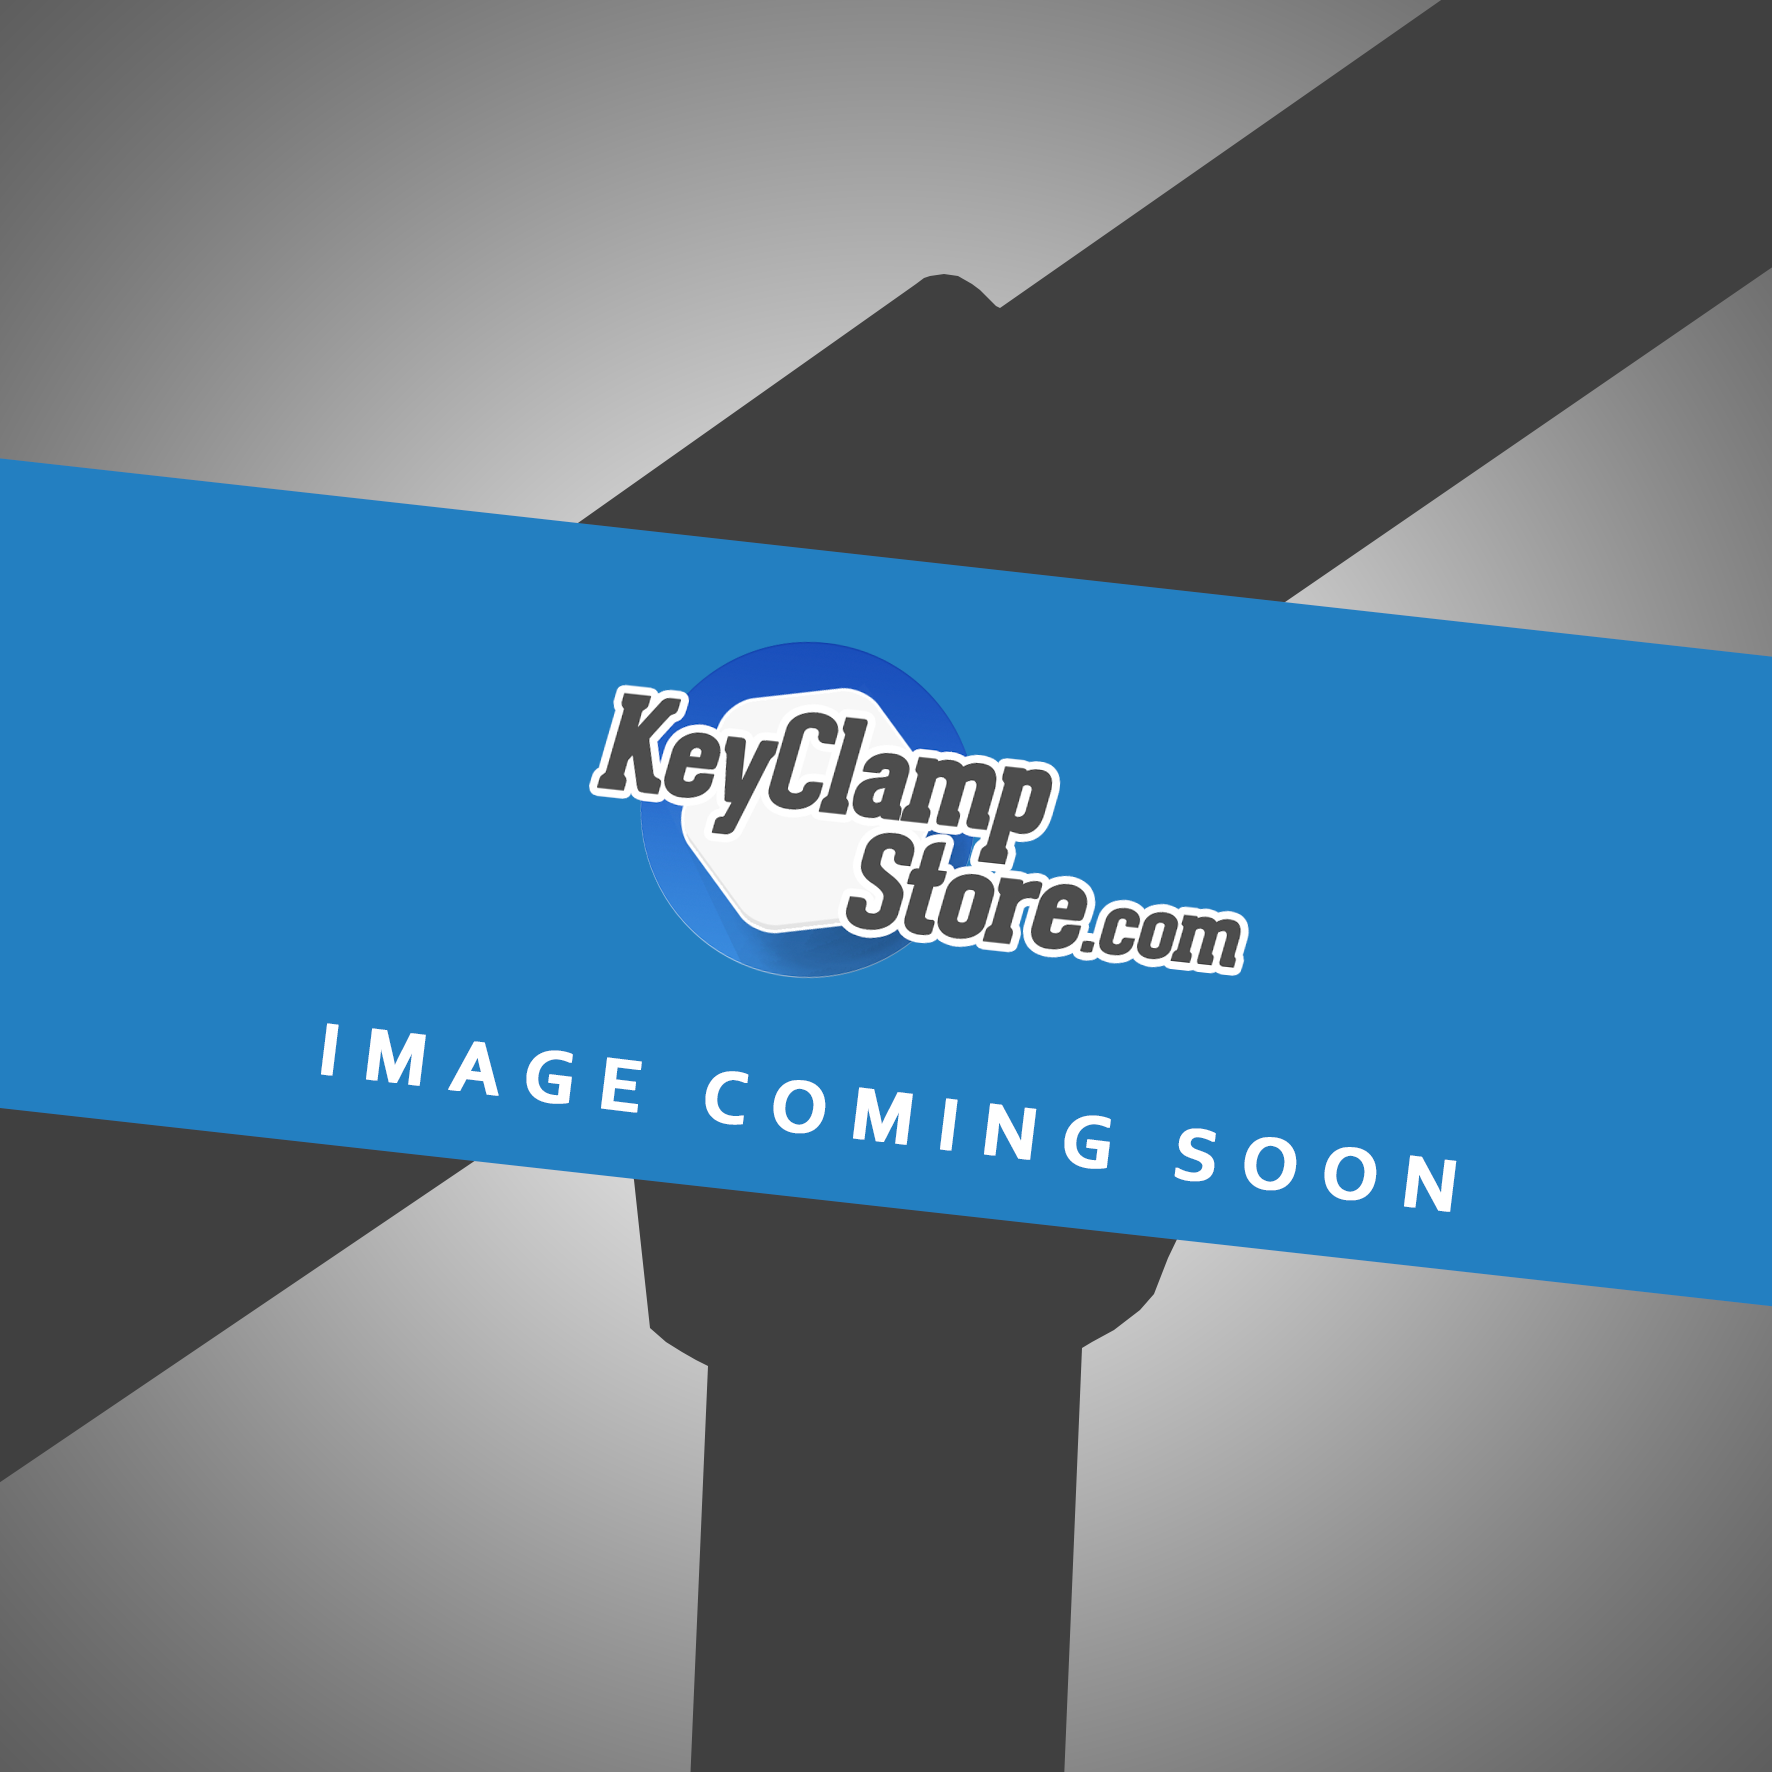 Key Clamp Internal Connector Sleeve 27mm 150-A27